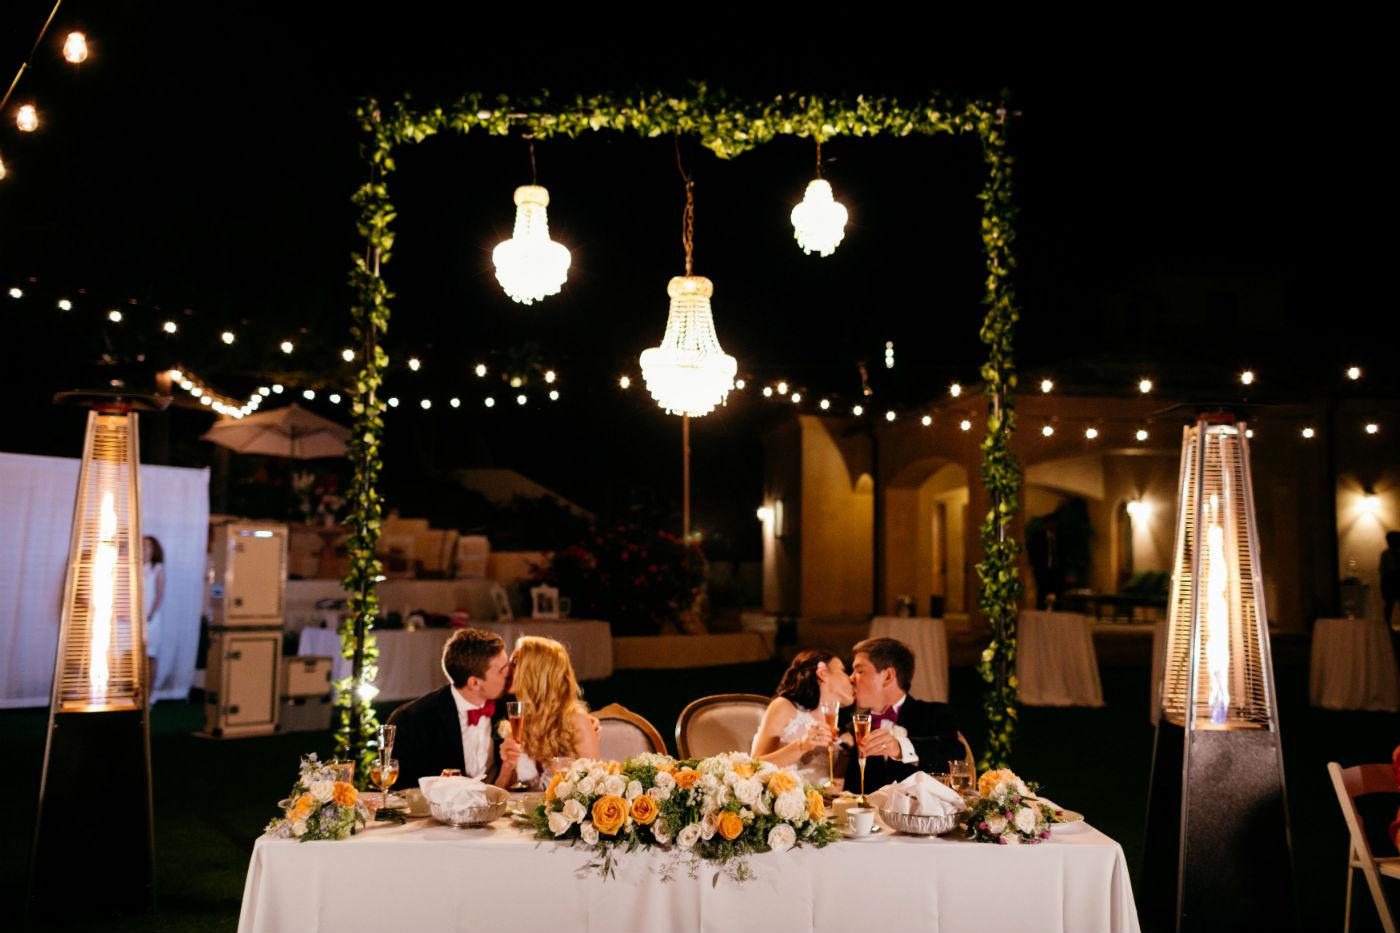 los-angeles-chicago-wedding-music-ceremony-strings-string-quartet-violin-cello-cocktial-musicians-mailbu-pacific-coast-strings-5.jpg